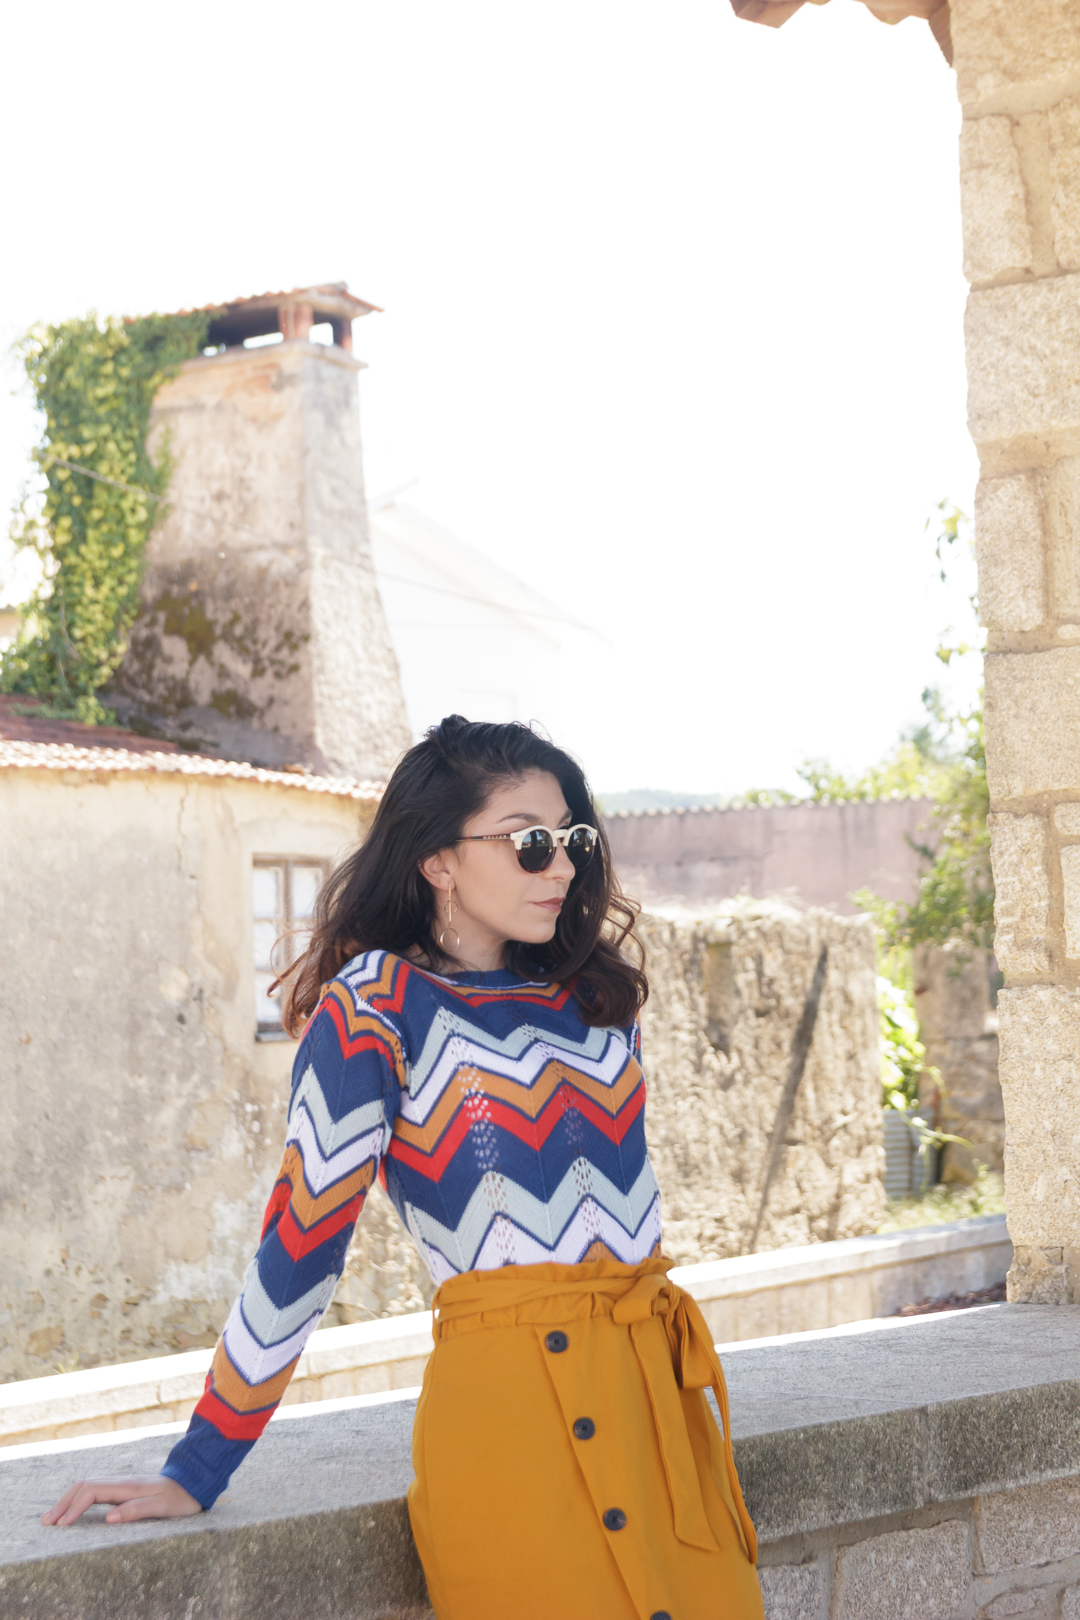 Camisola colorida de malha